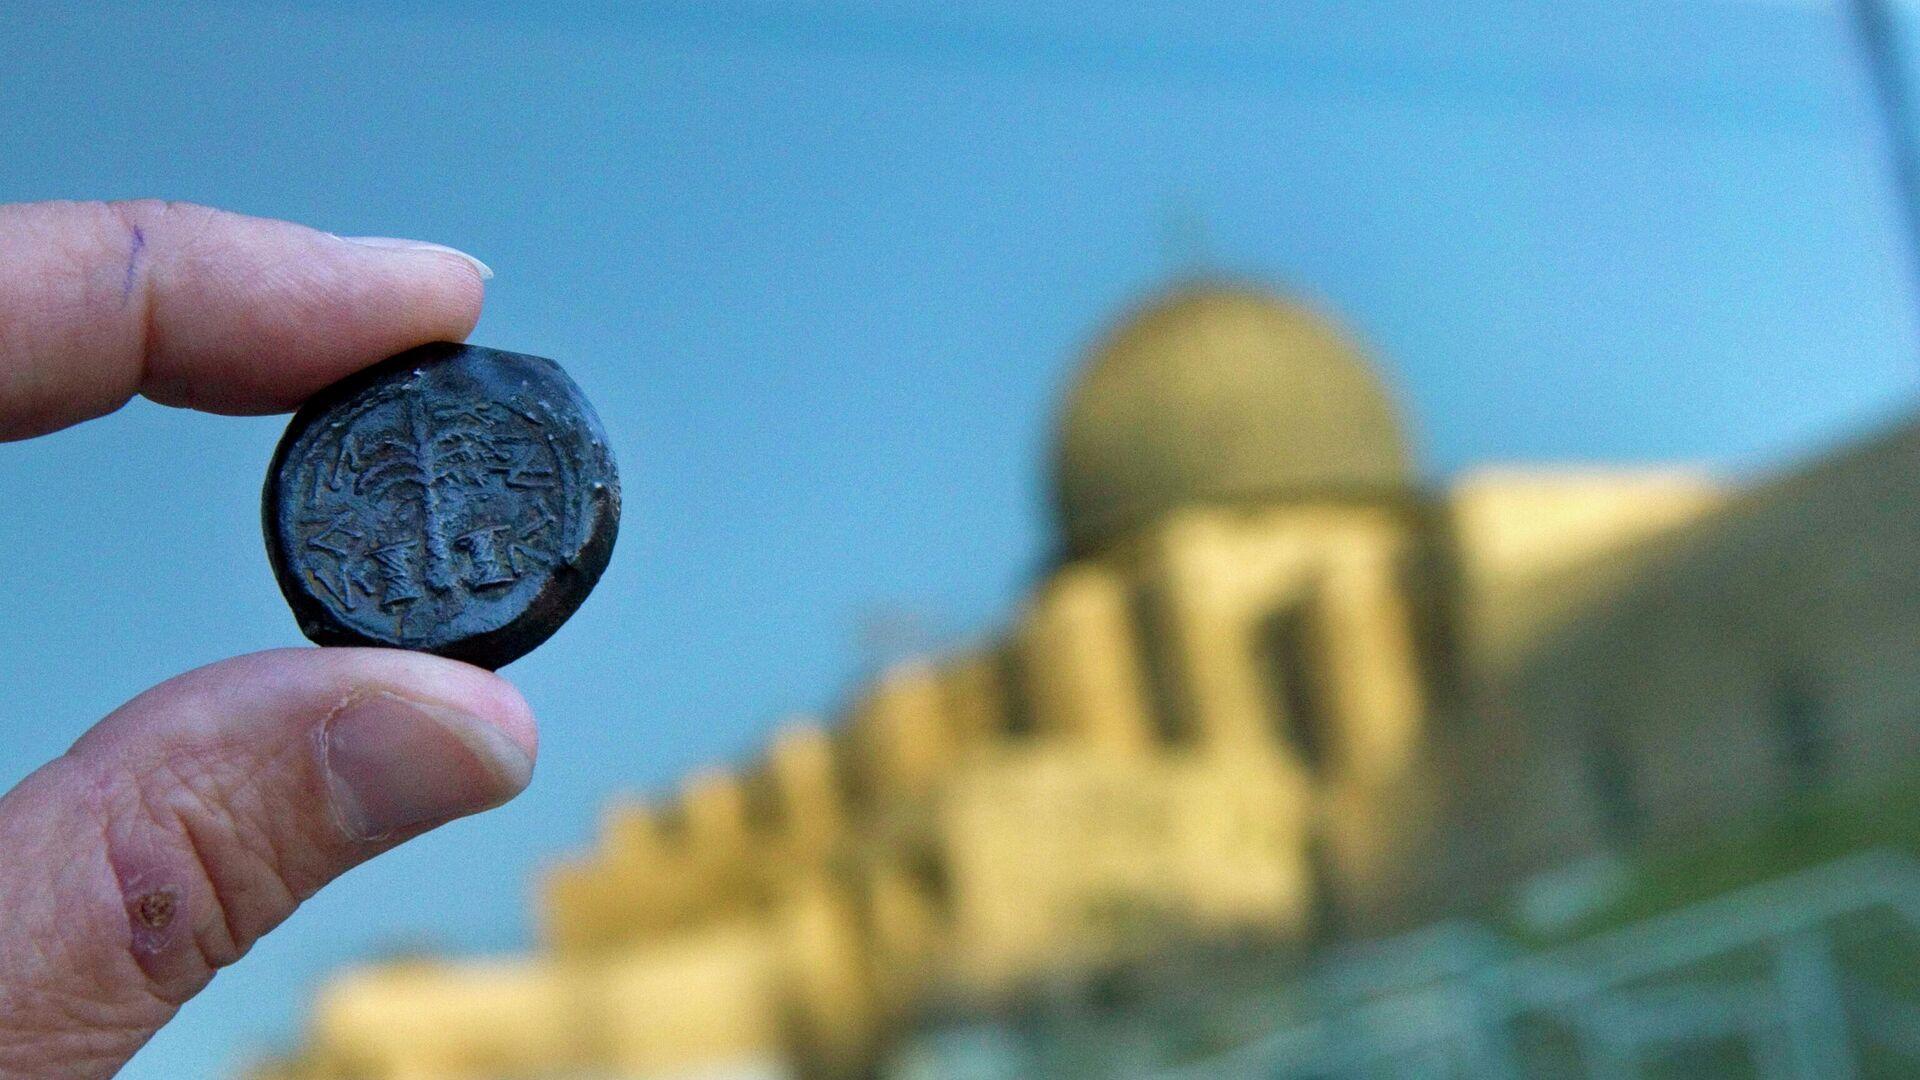 Una moneda romana y la vista de Jerusalén (archivo) - Sputnik Mundo, 1920, 12.02.2021